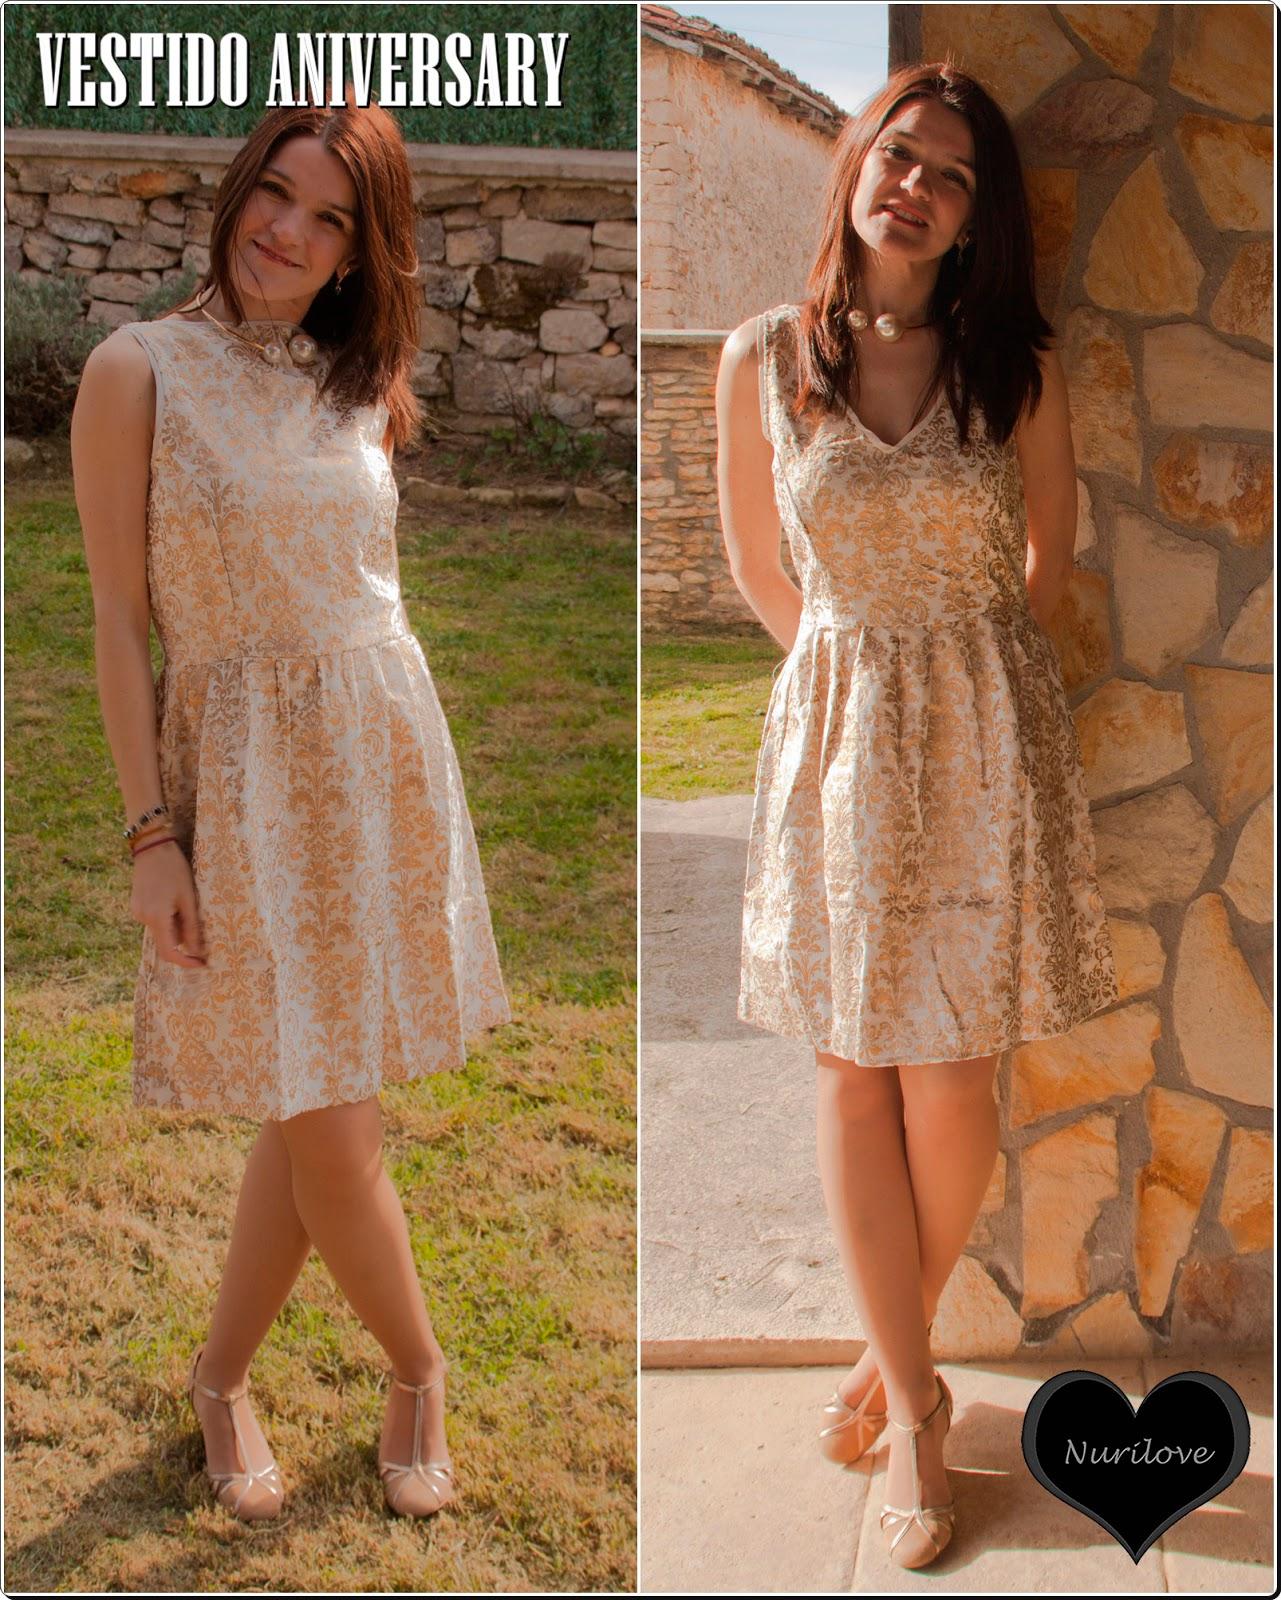 Vestido aniversary, ideal para tu próximo evento